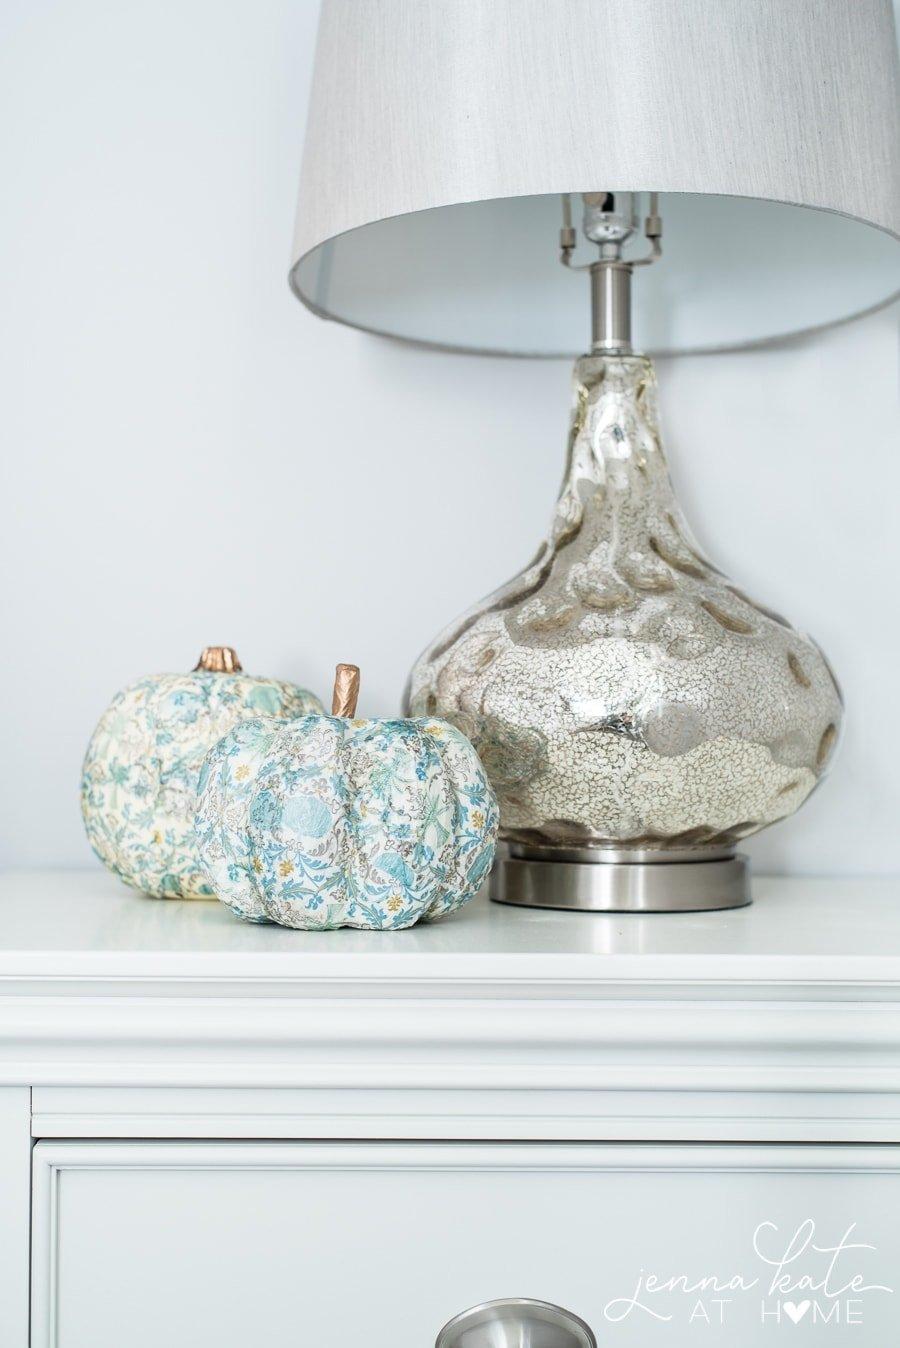 decoupaged pumpkins next to a mercury glass lamp